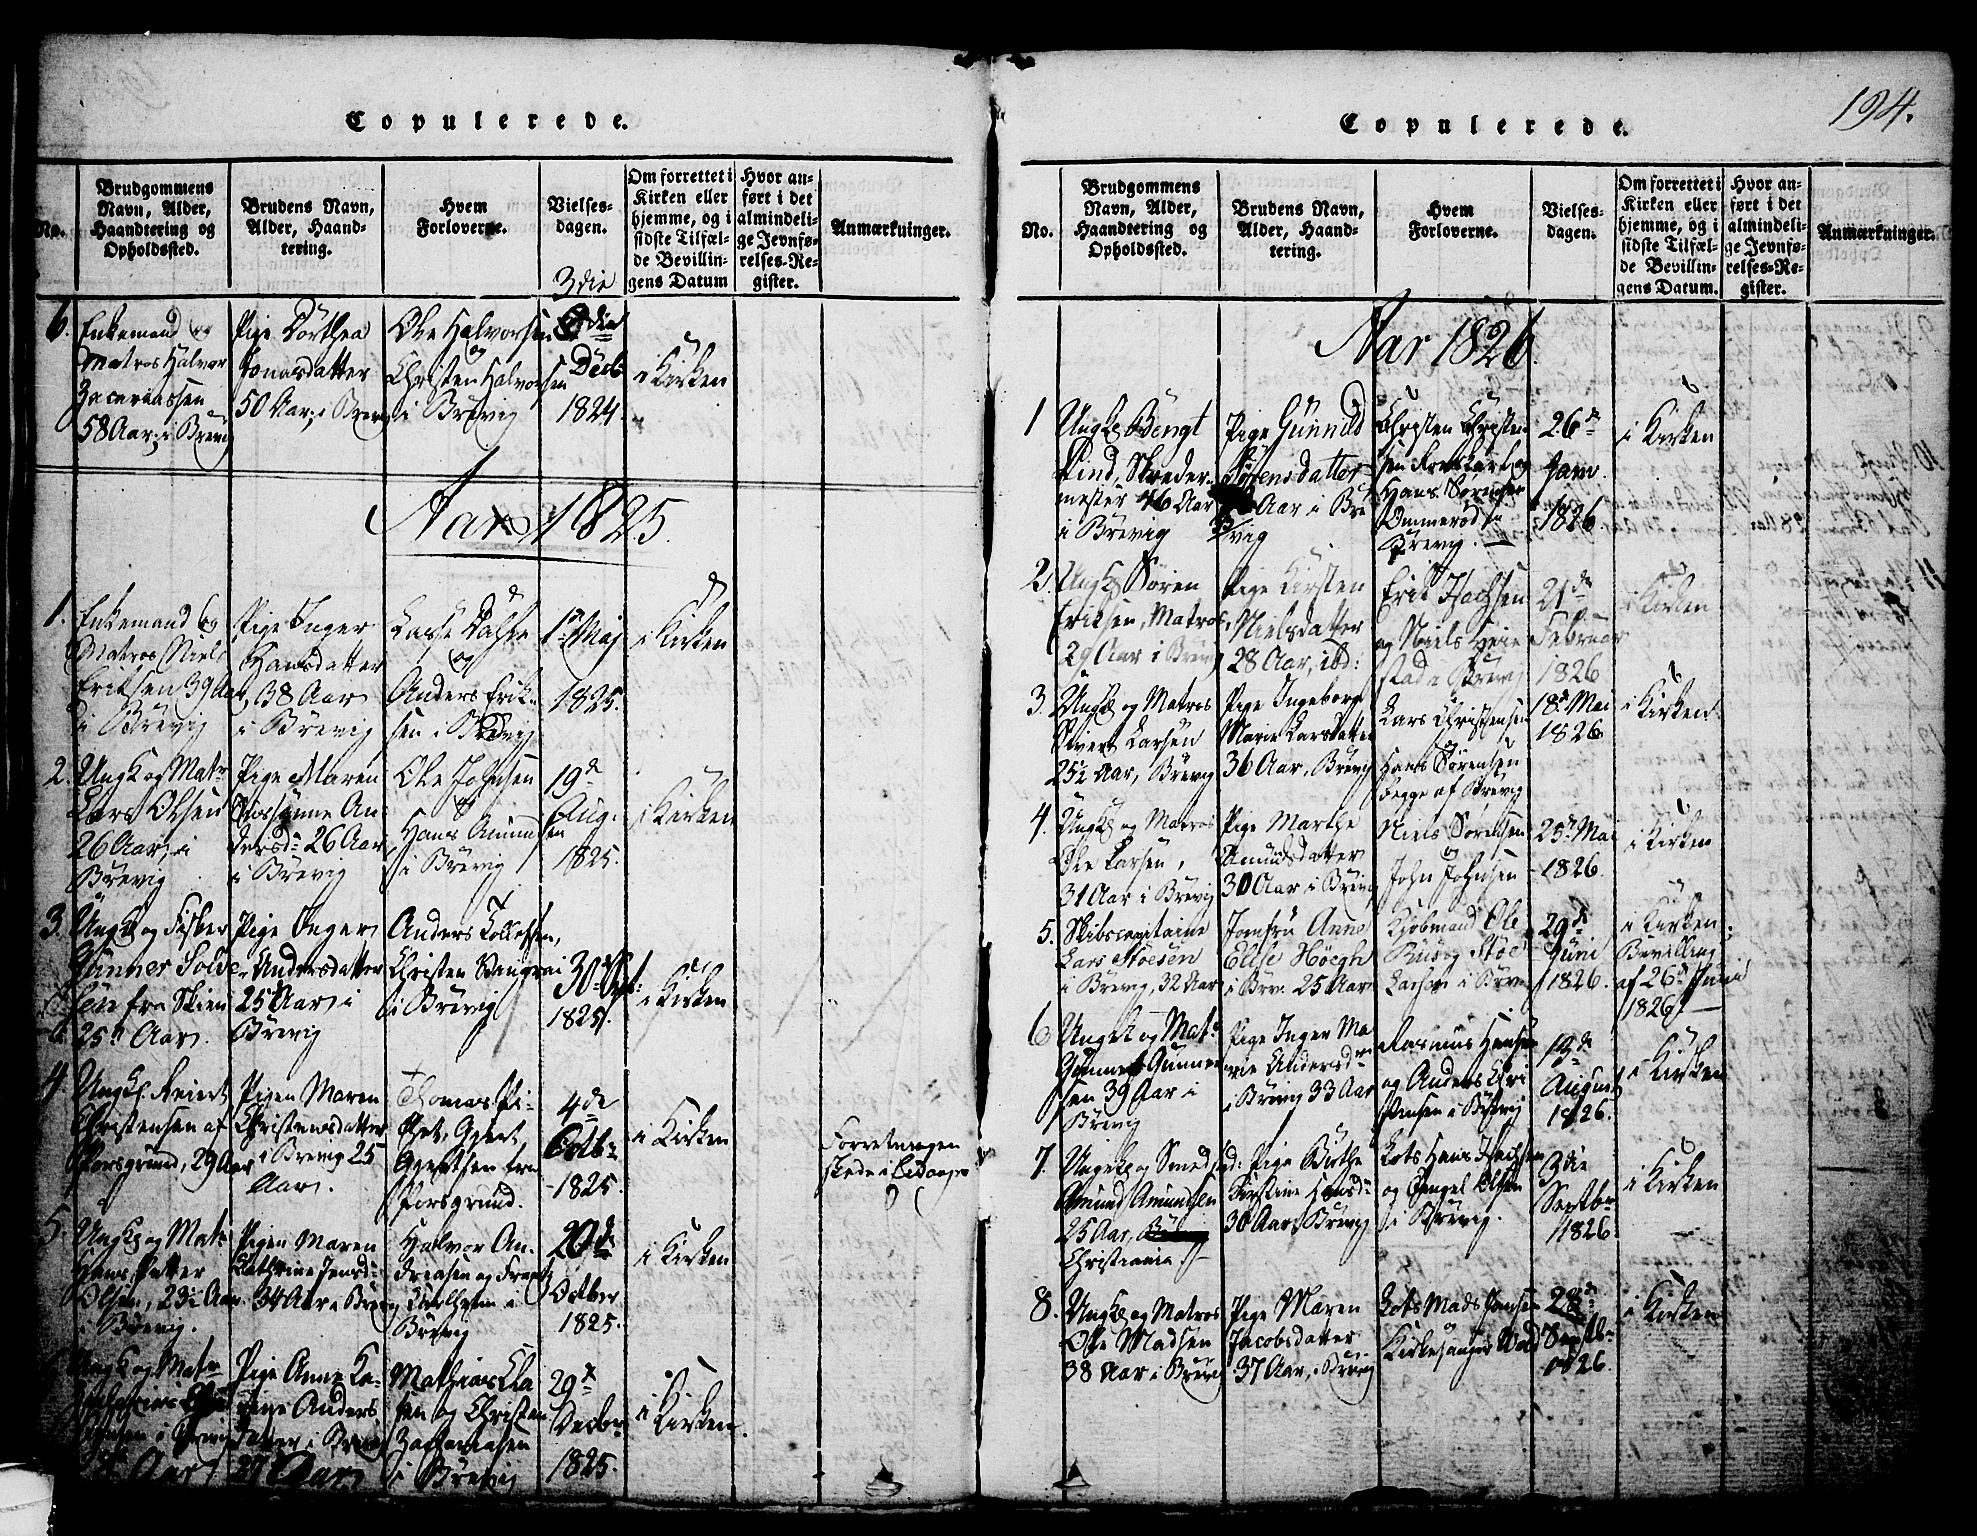 SAKO, Brevik kirkebøker, G/Ga/L0001: Klokkerbok nr. 1, 1814-1845, s. 194